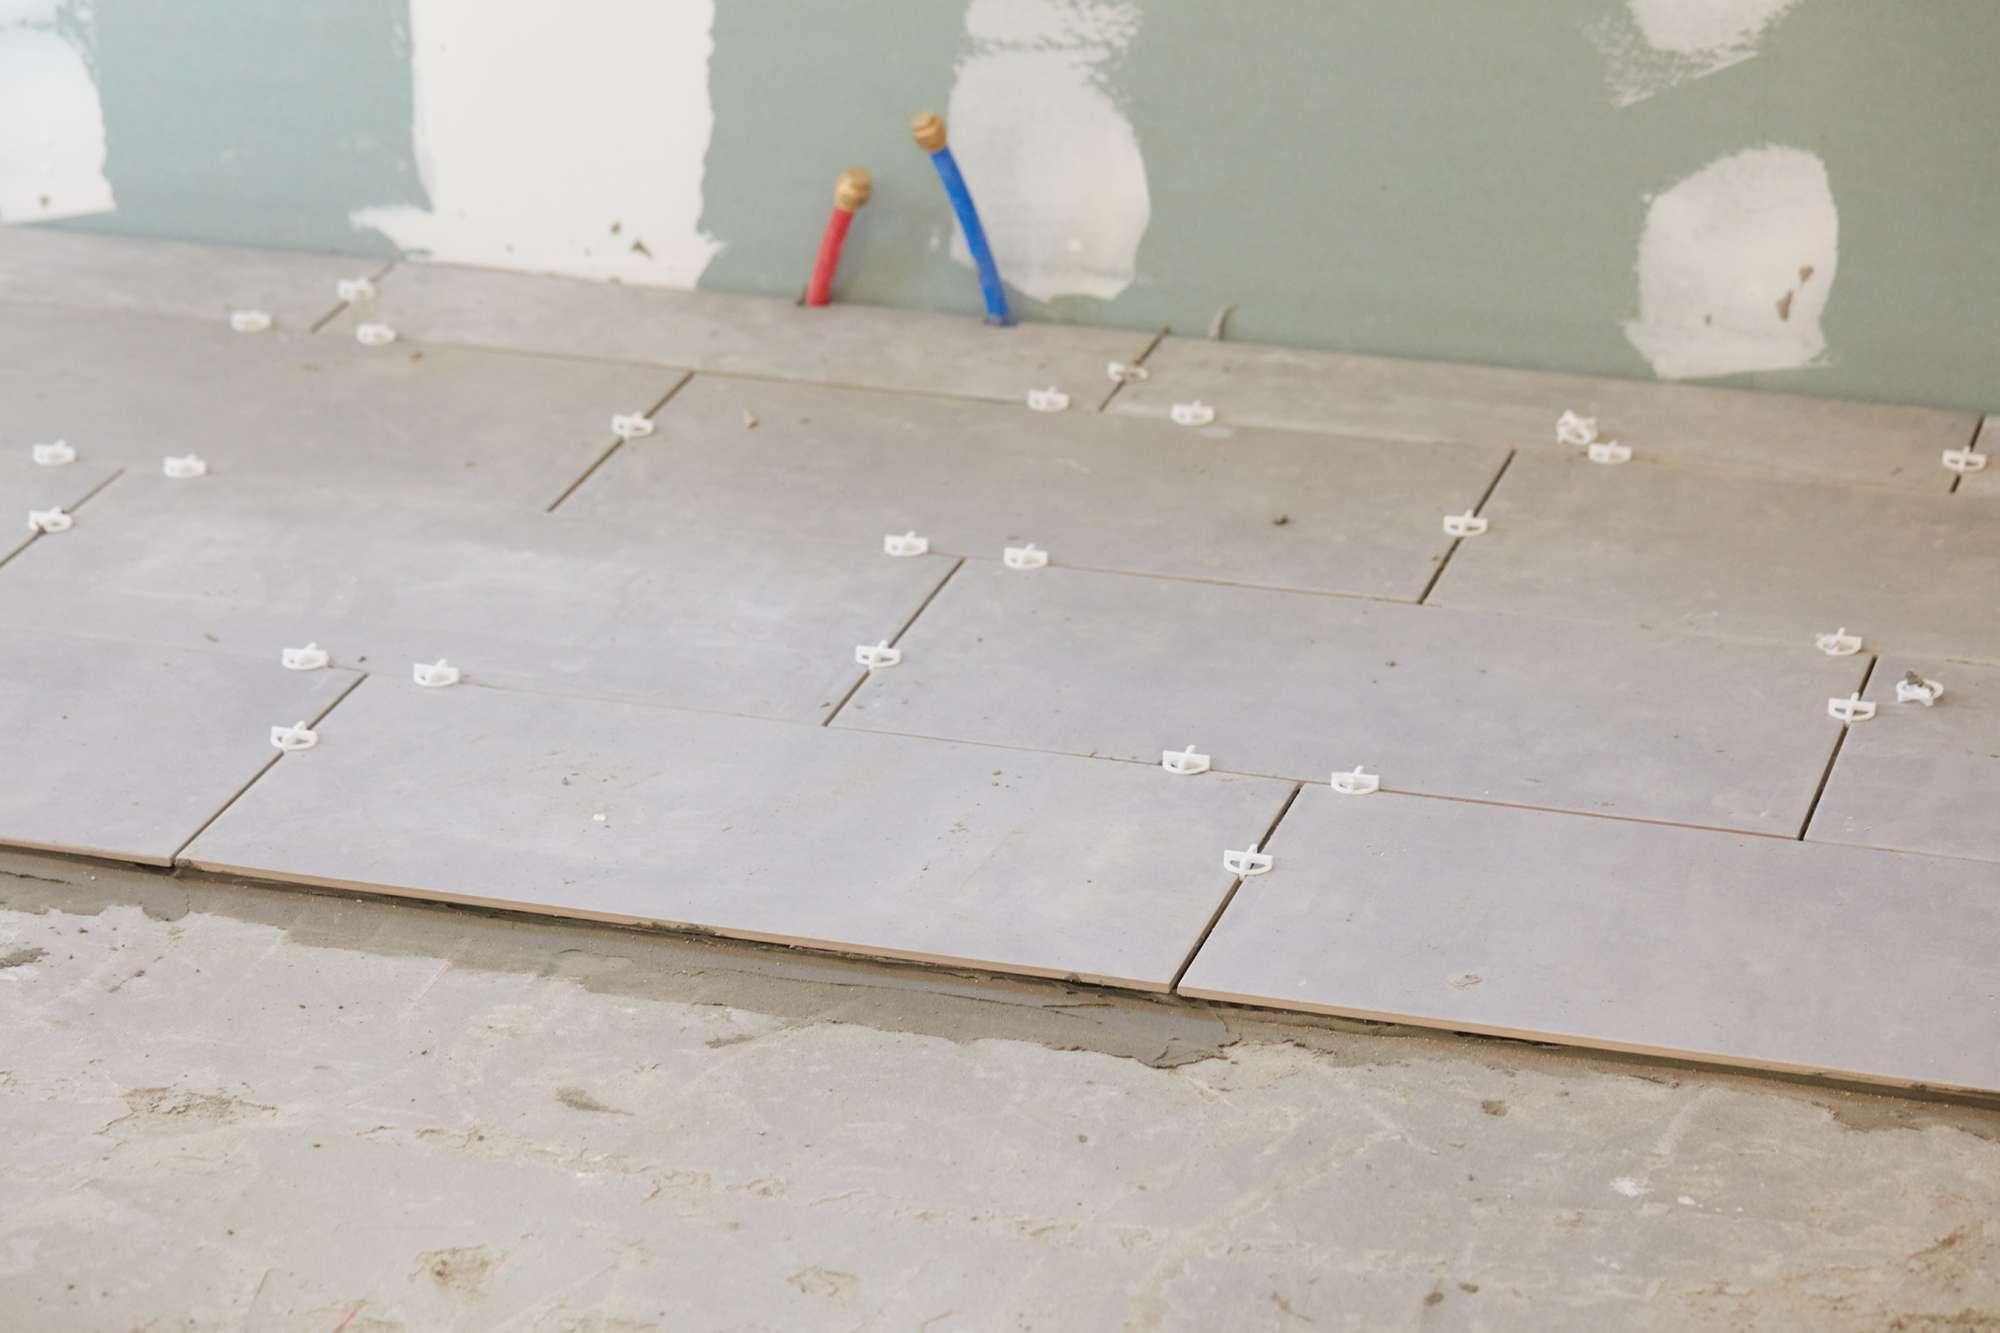 Kitchen flooring installed with ceramic tiles